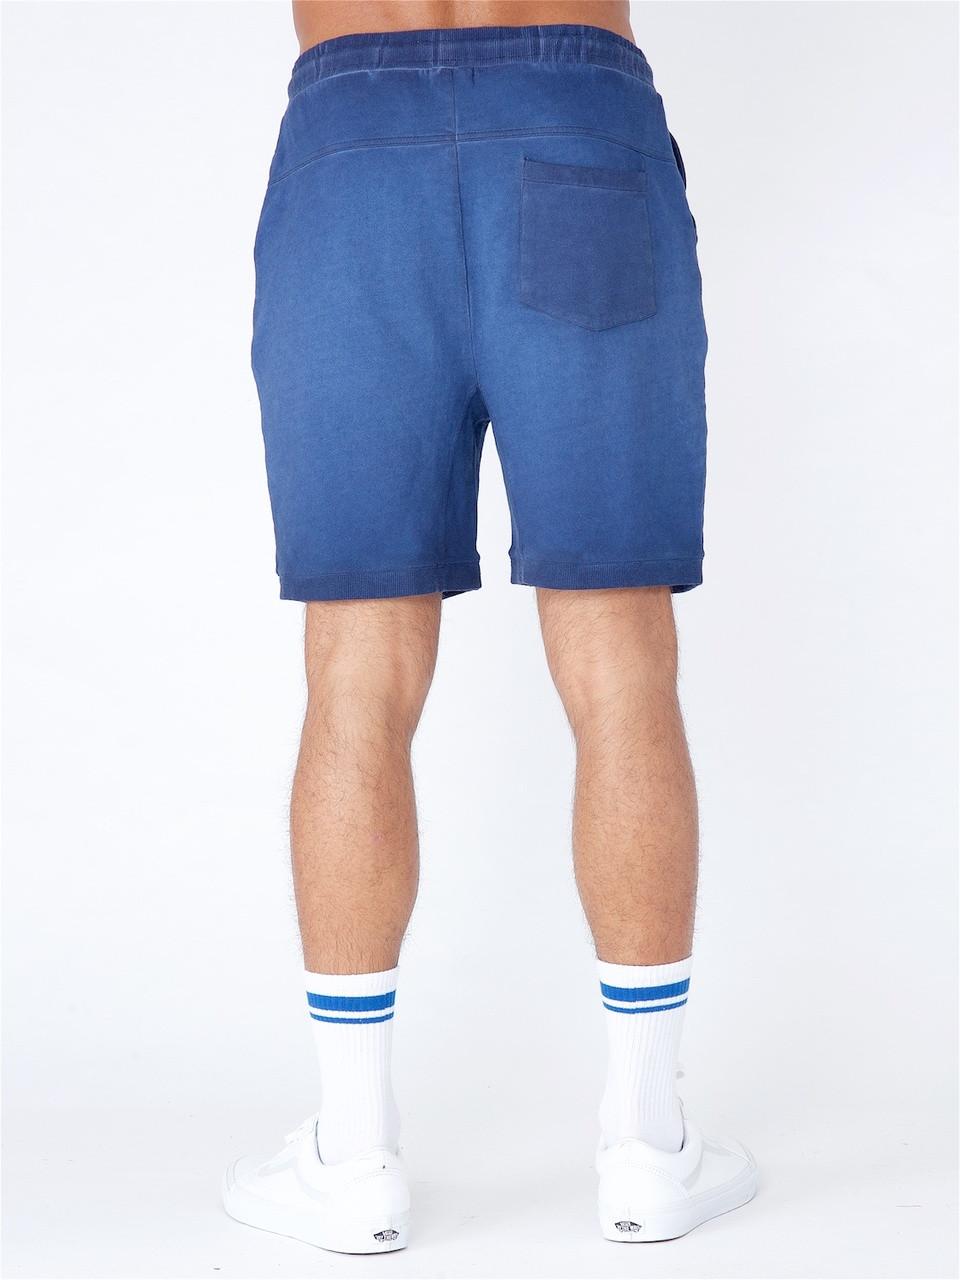 Navy Acid Wash Jersey Shorts